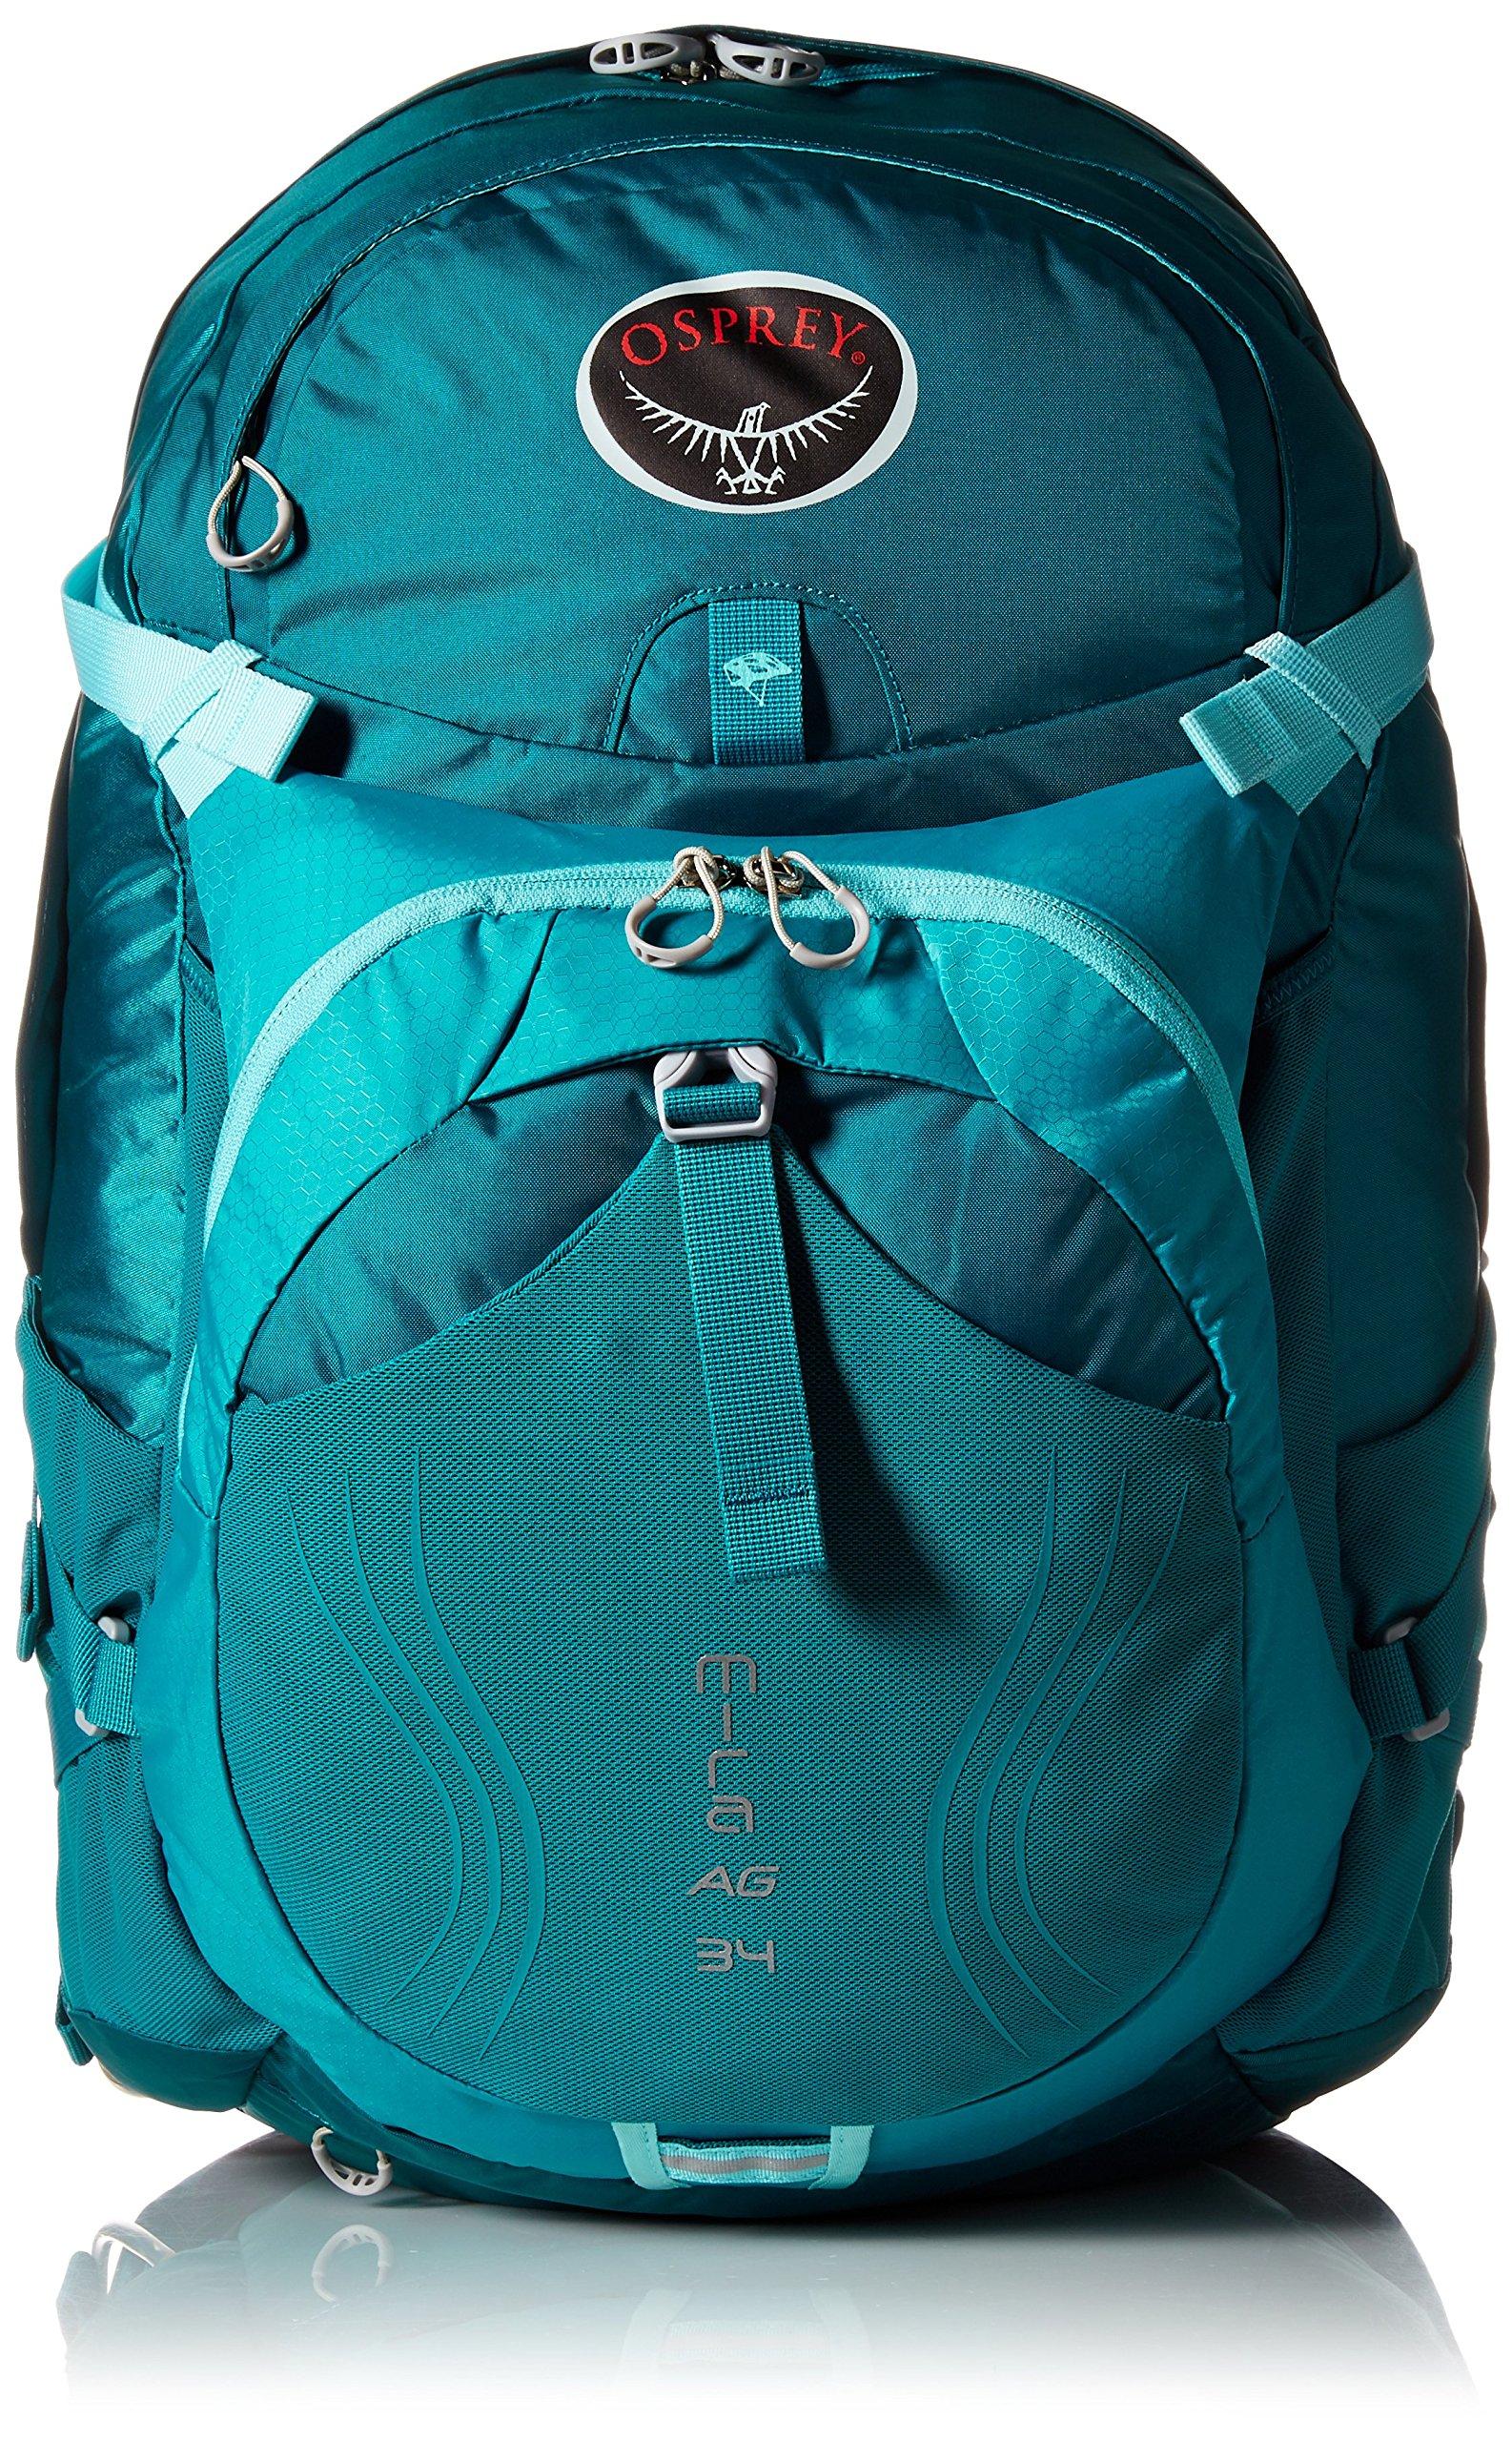 Osprey Packs Women's Mira AG 34 Hydration Pack, Bondi Blue, X-Small/Small